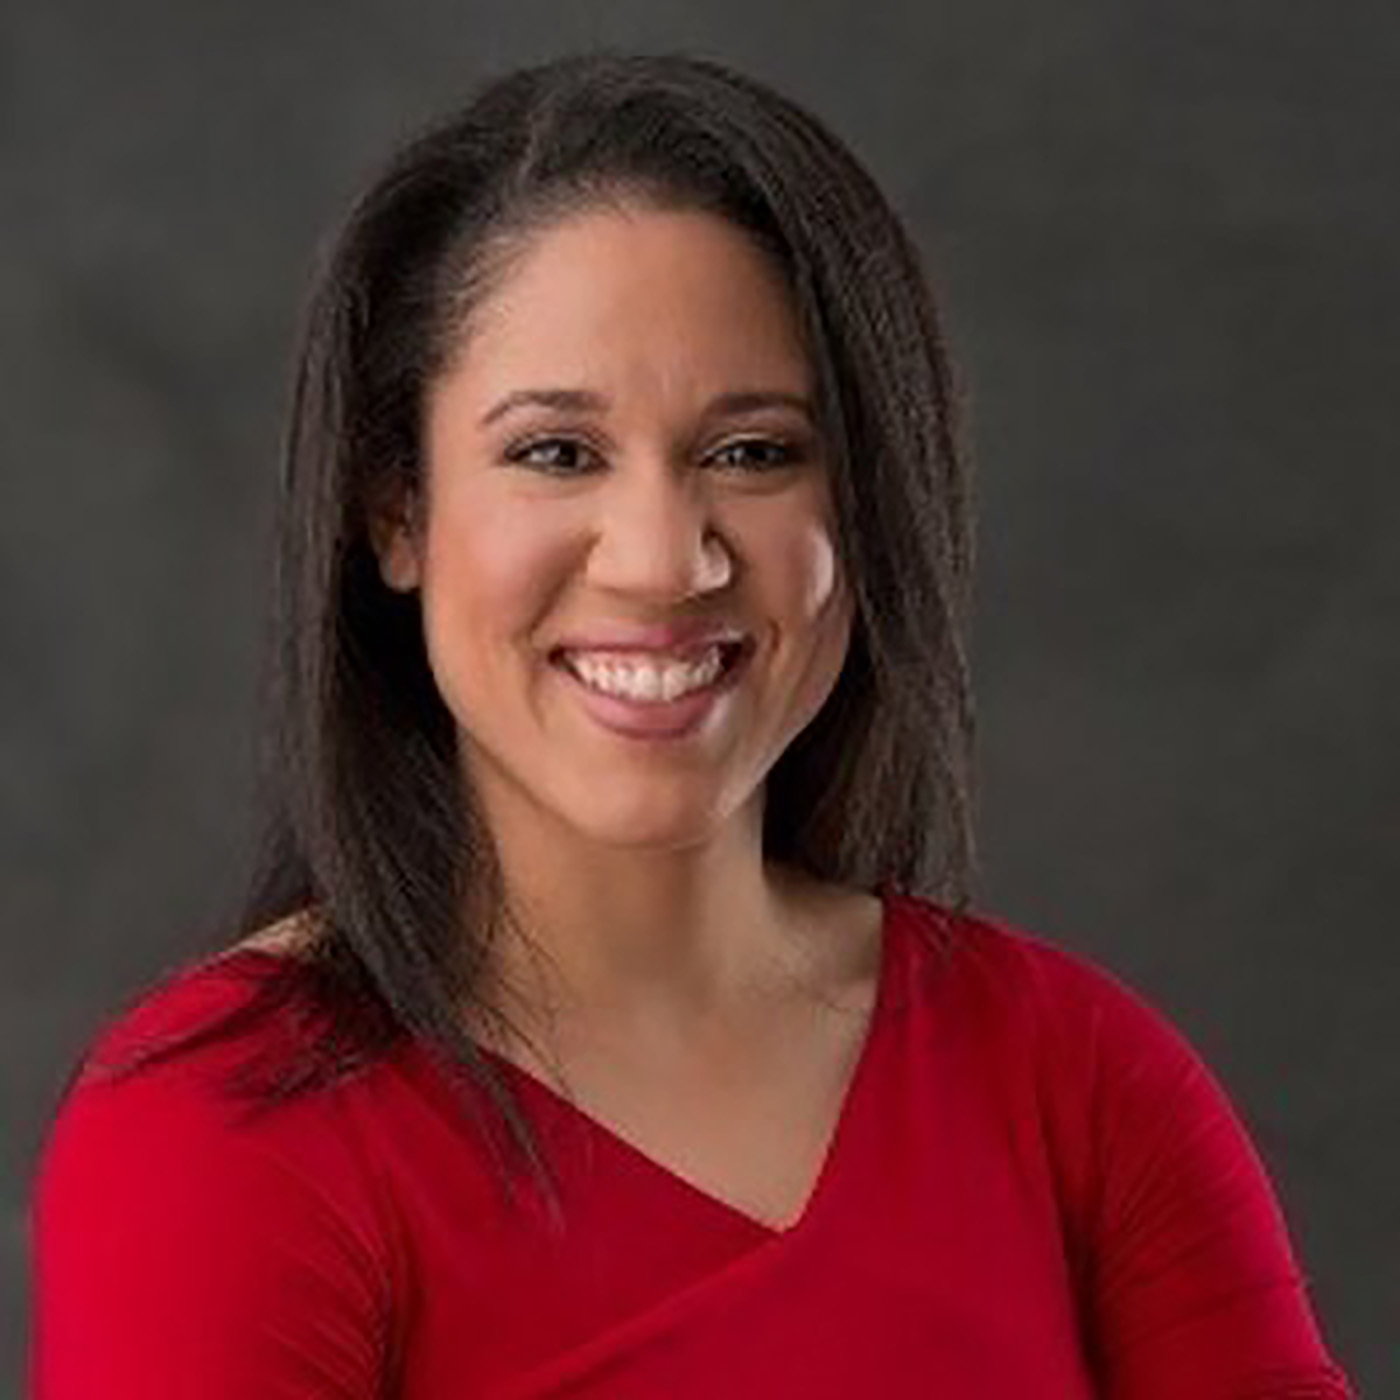 Kara Lawson, Former WNBA player and Current Washington Wizards TV Analyst